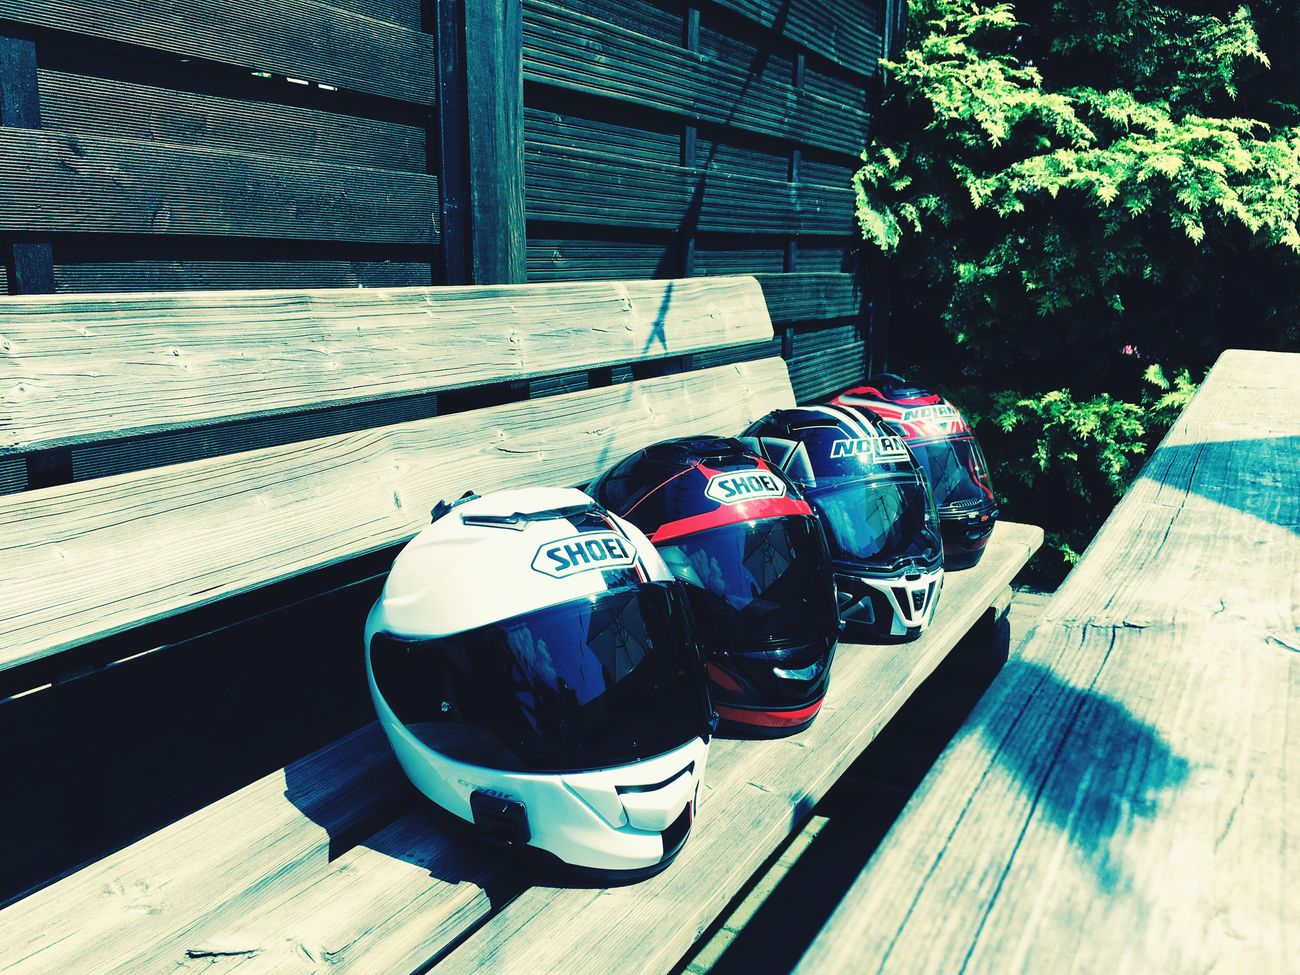 4 helmets